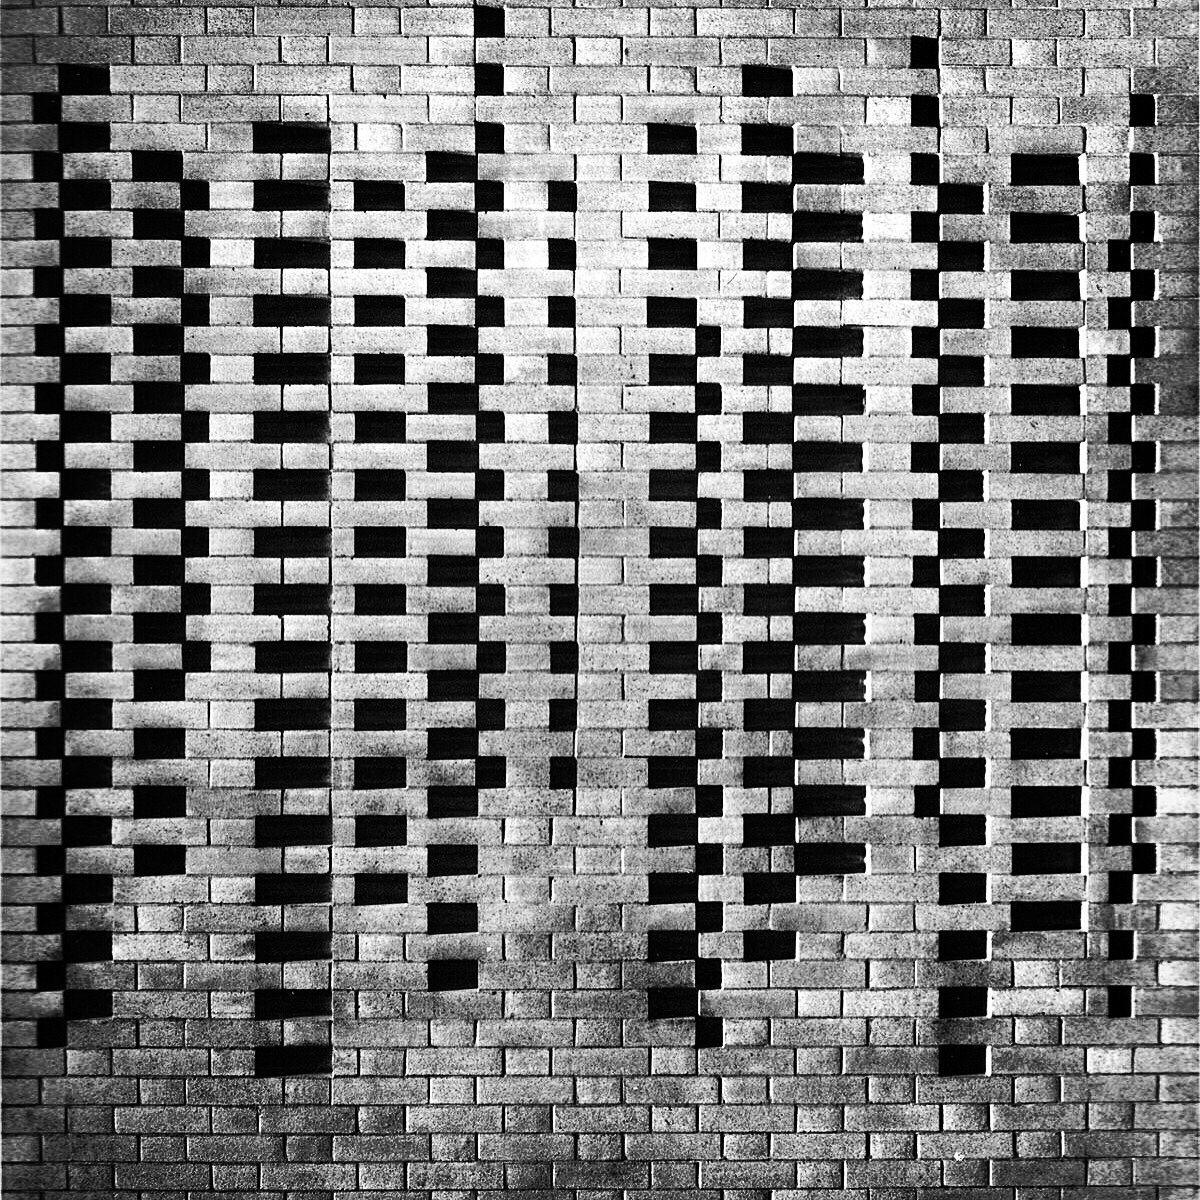 JOSEF #ALBERS BRICK #WALL DETAIL, #HARVARD #UNIVERSITY, 1949-50